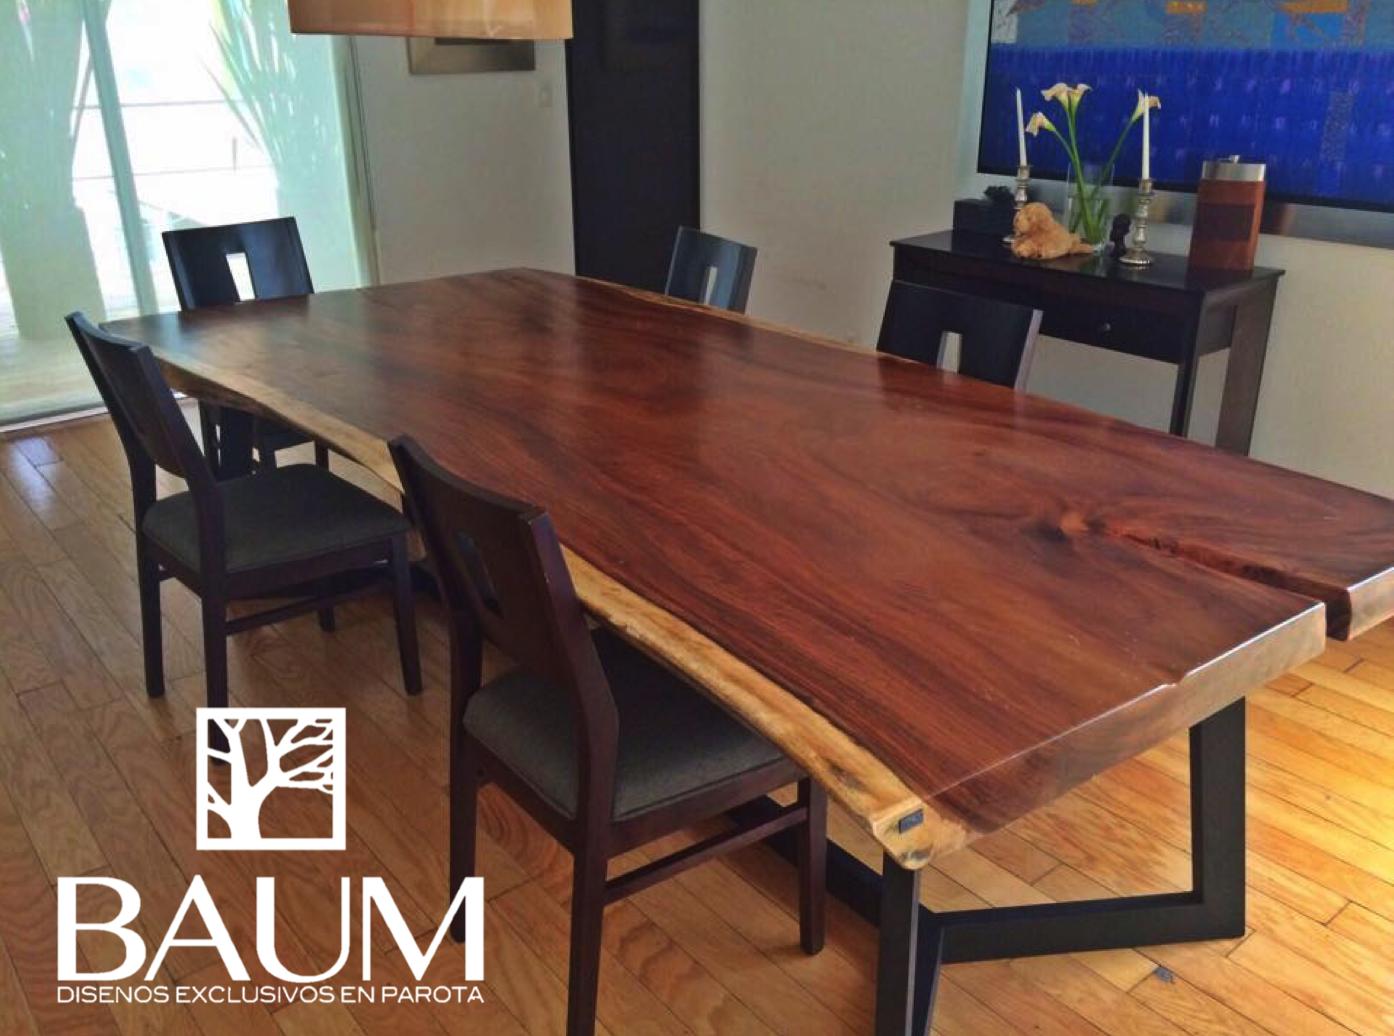 Pin by henryk gosztyla on st wood in 2019 muebles r sticos modernos mesas de parota mesas - Muebles rusticos modernos ...